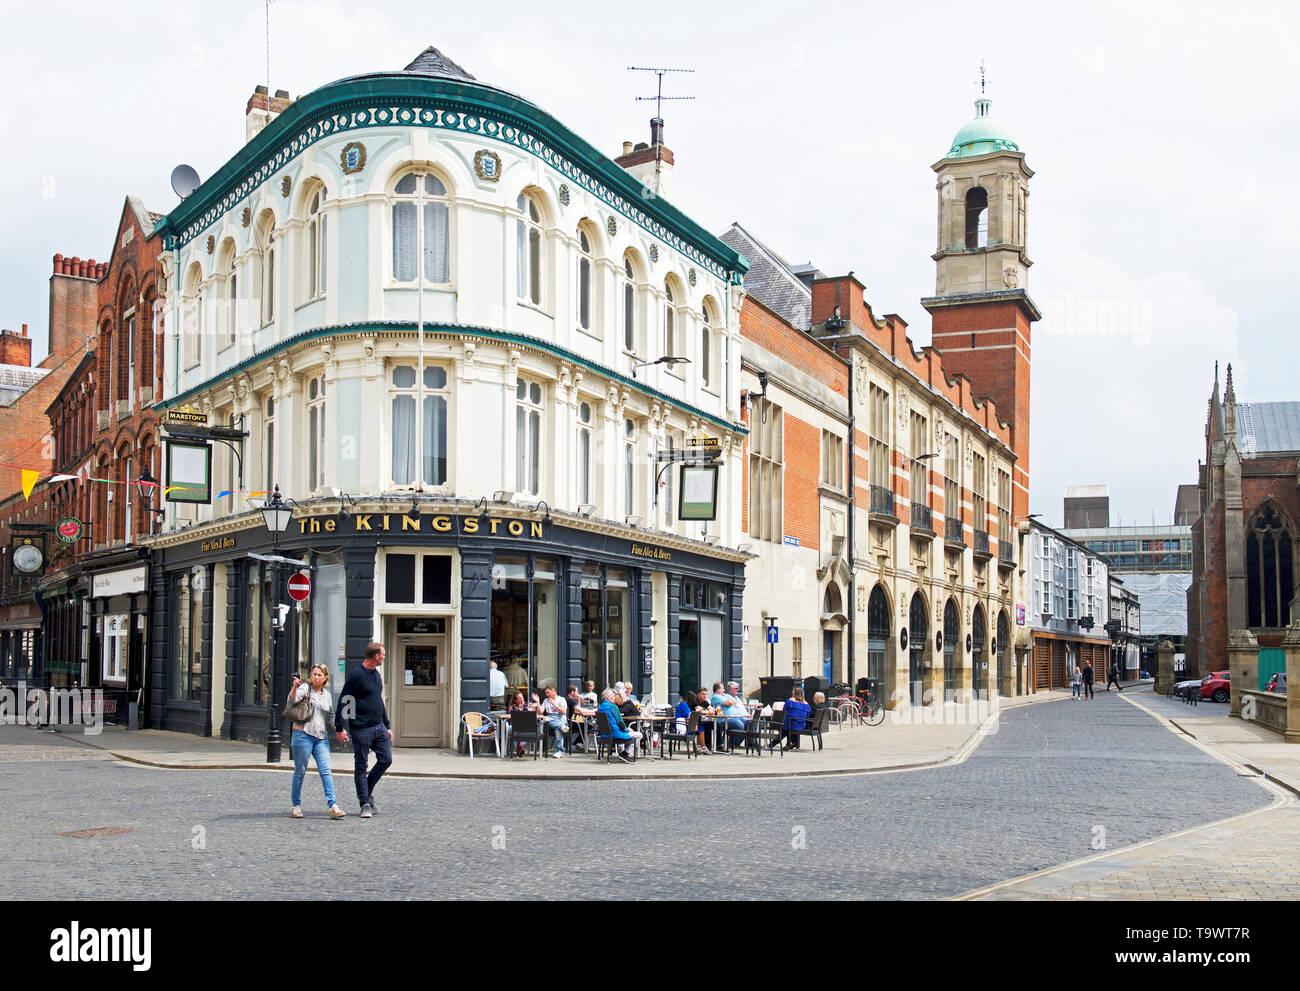 The Kingston pub in Trinity Square, Kingston upon Hull, East Yorkshire, England UK - Stock Image